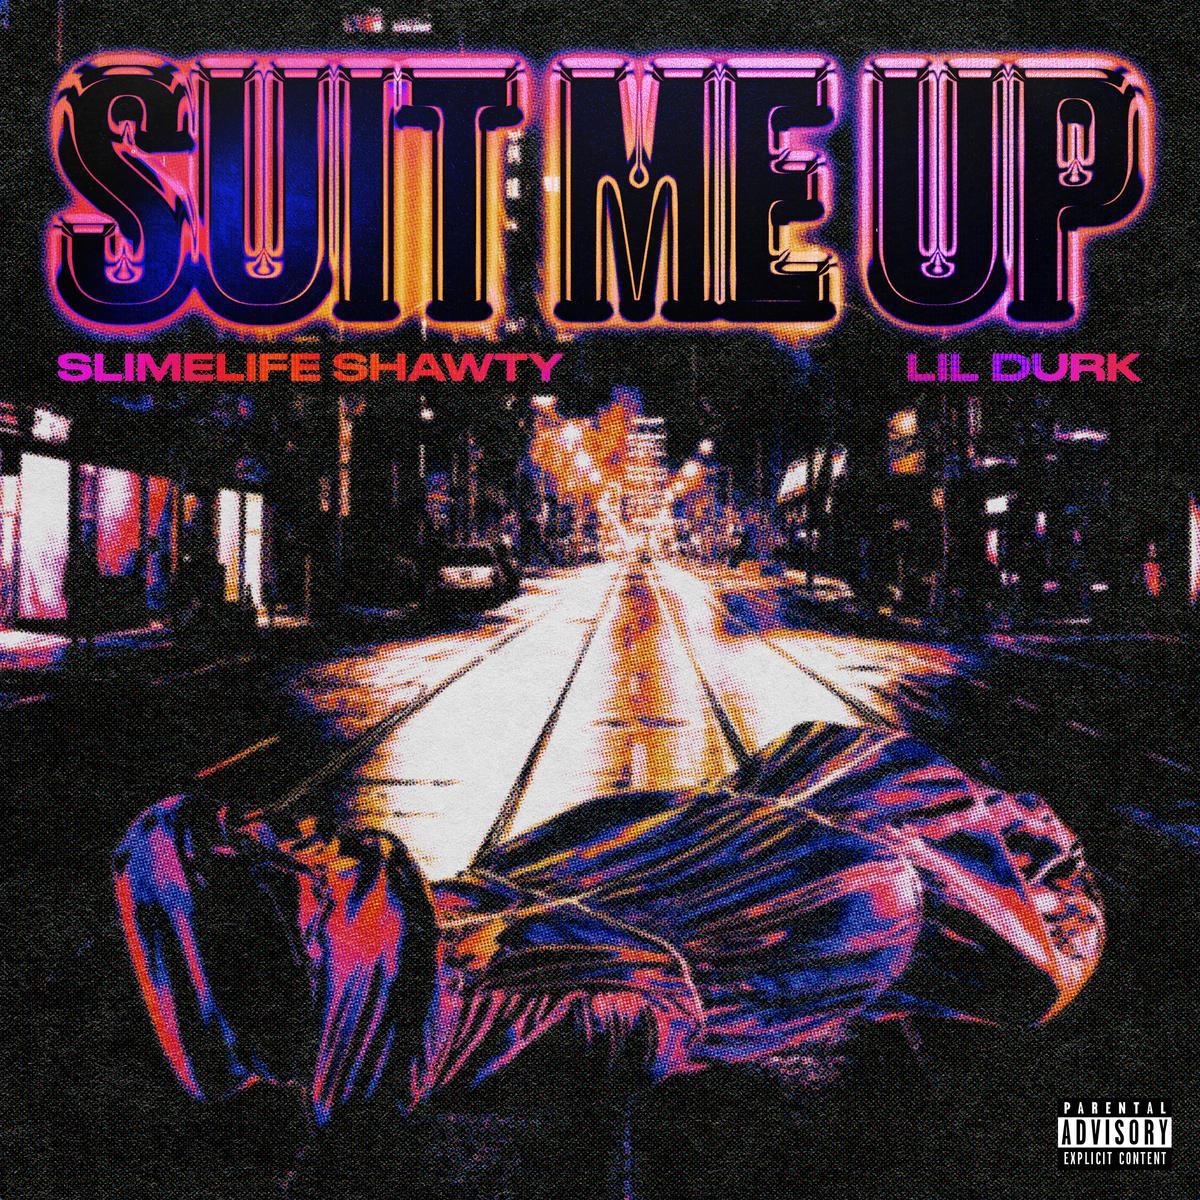 MP3: Slimelife Shawty - Suit Me Up Ft. Lil Durk